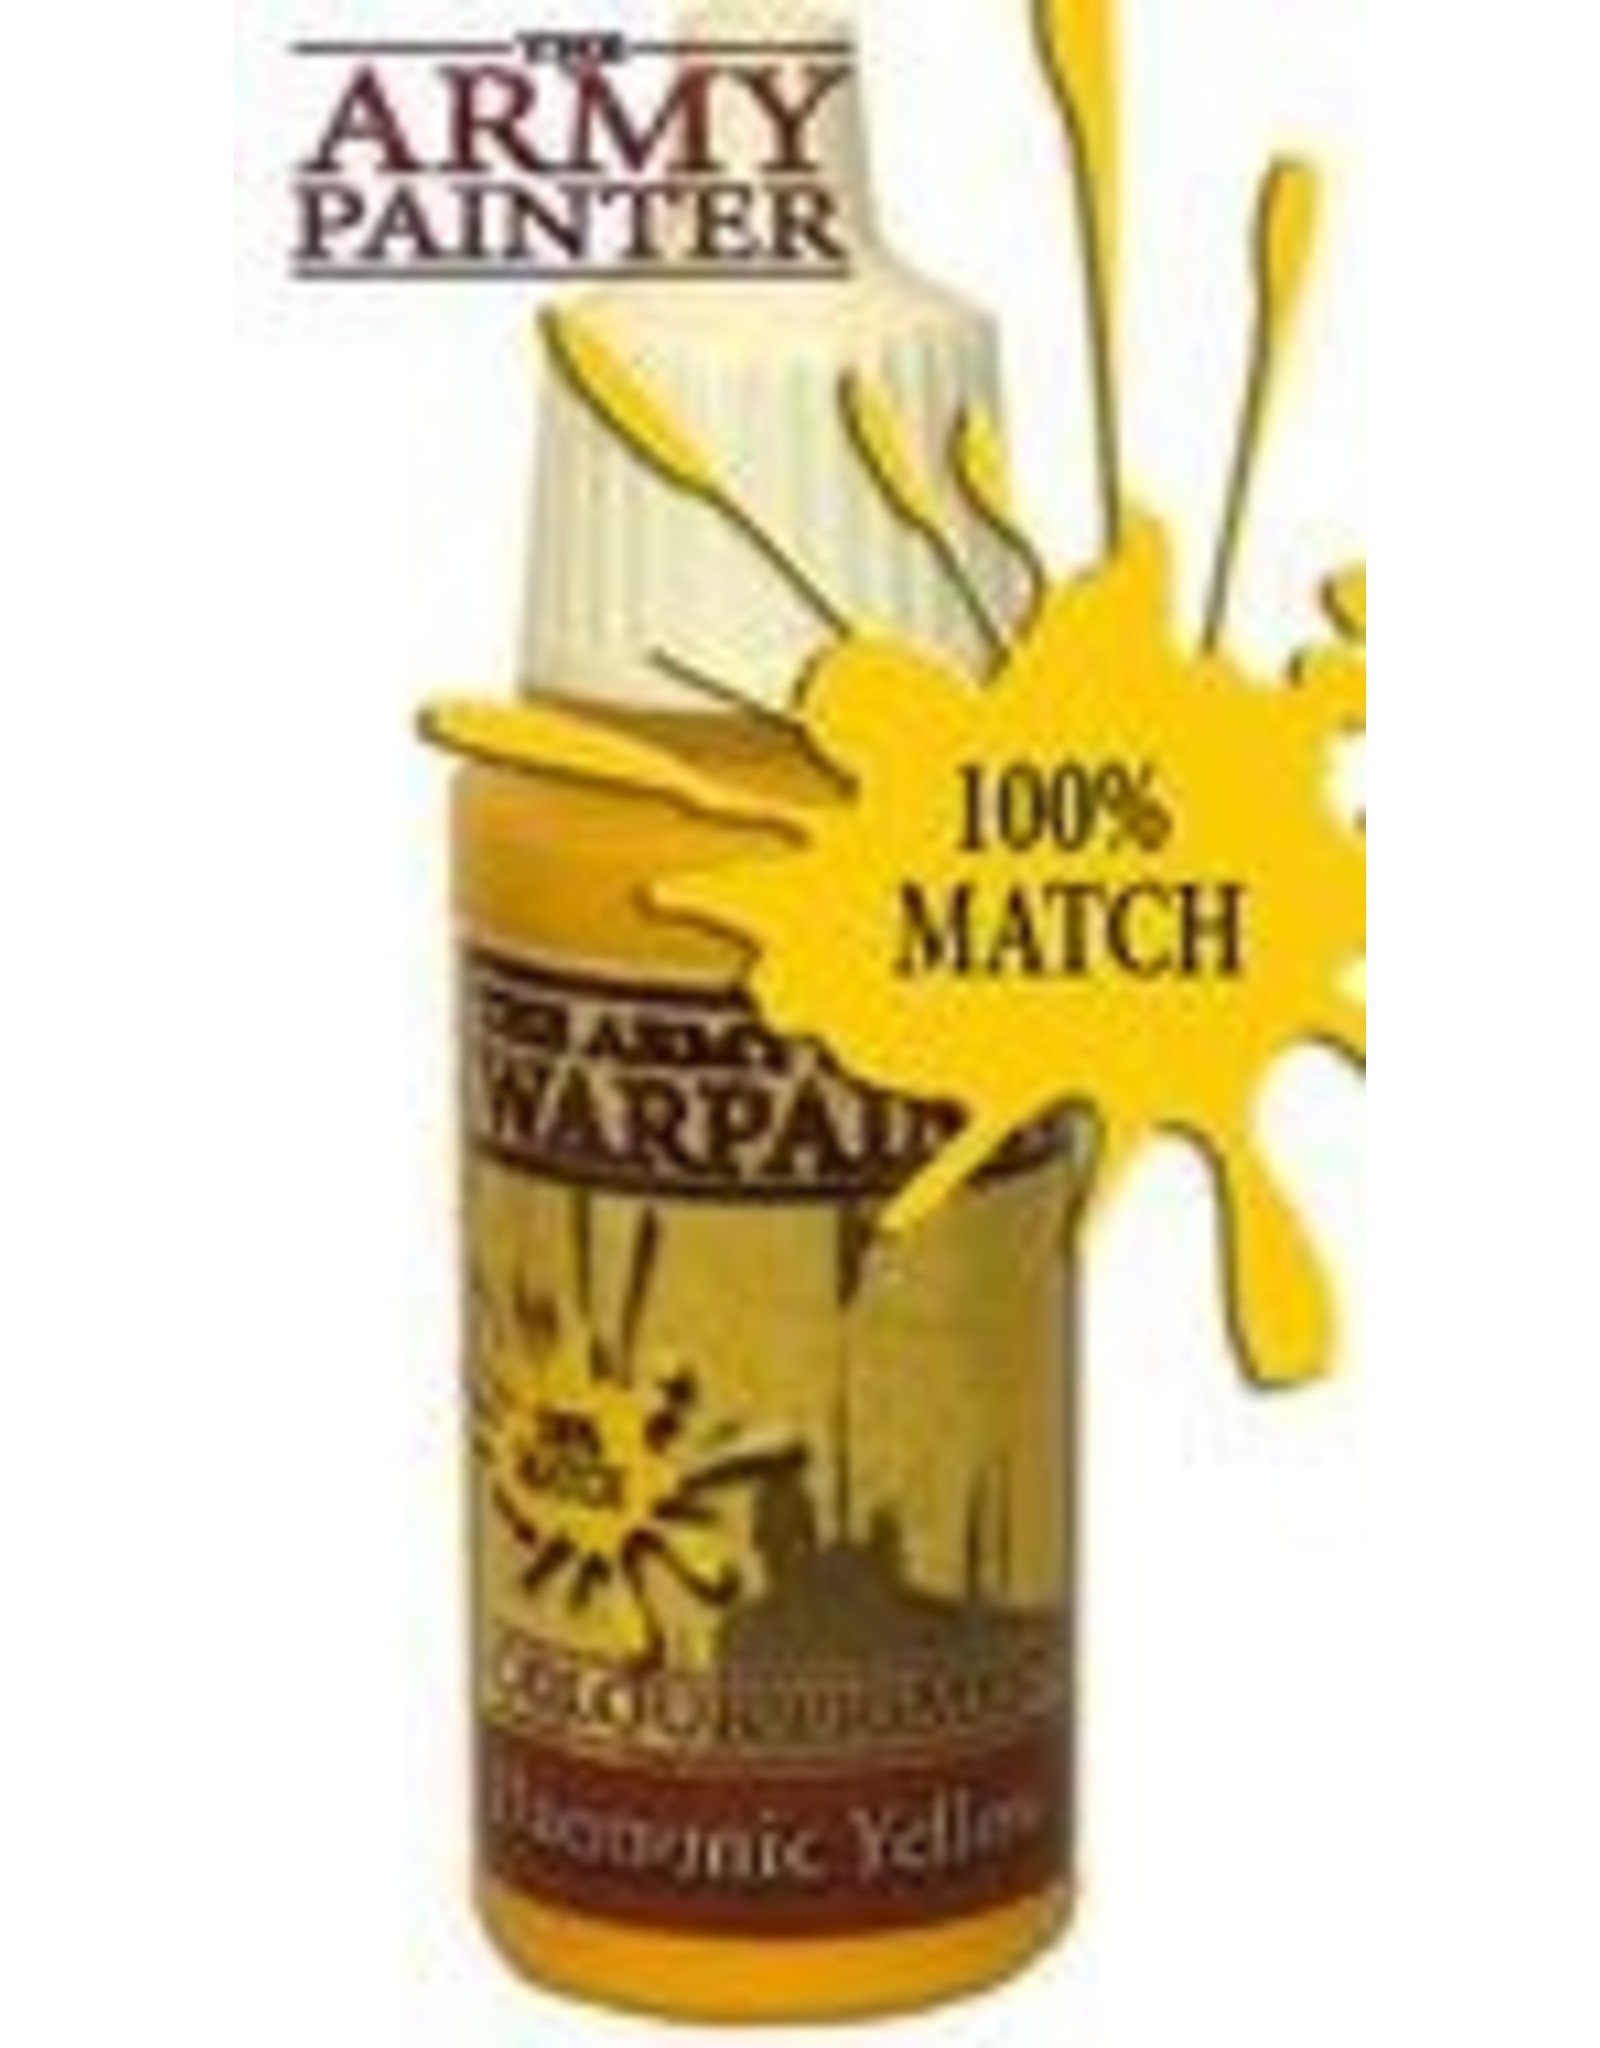 Army Painter Army Painter: Daemonic Yellow